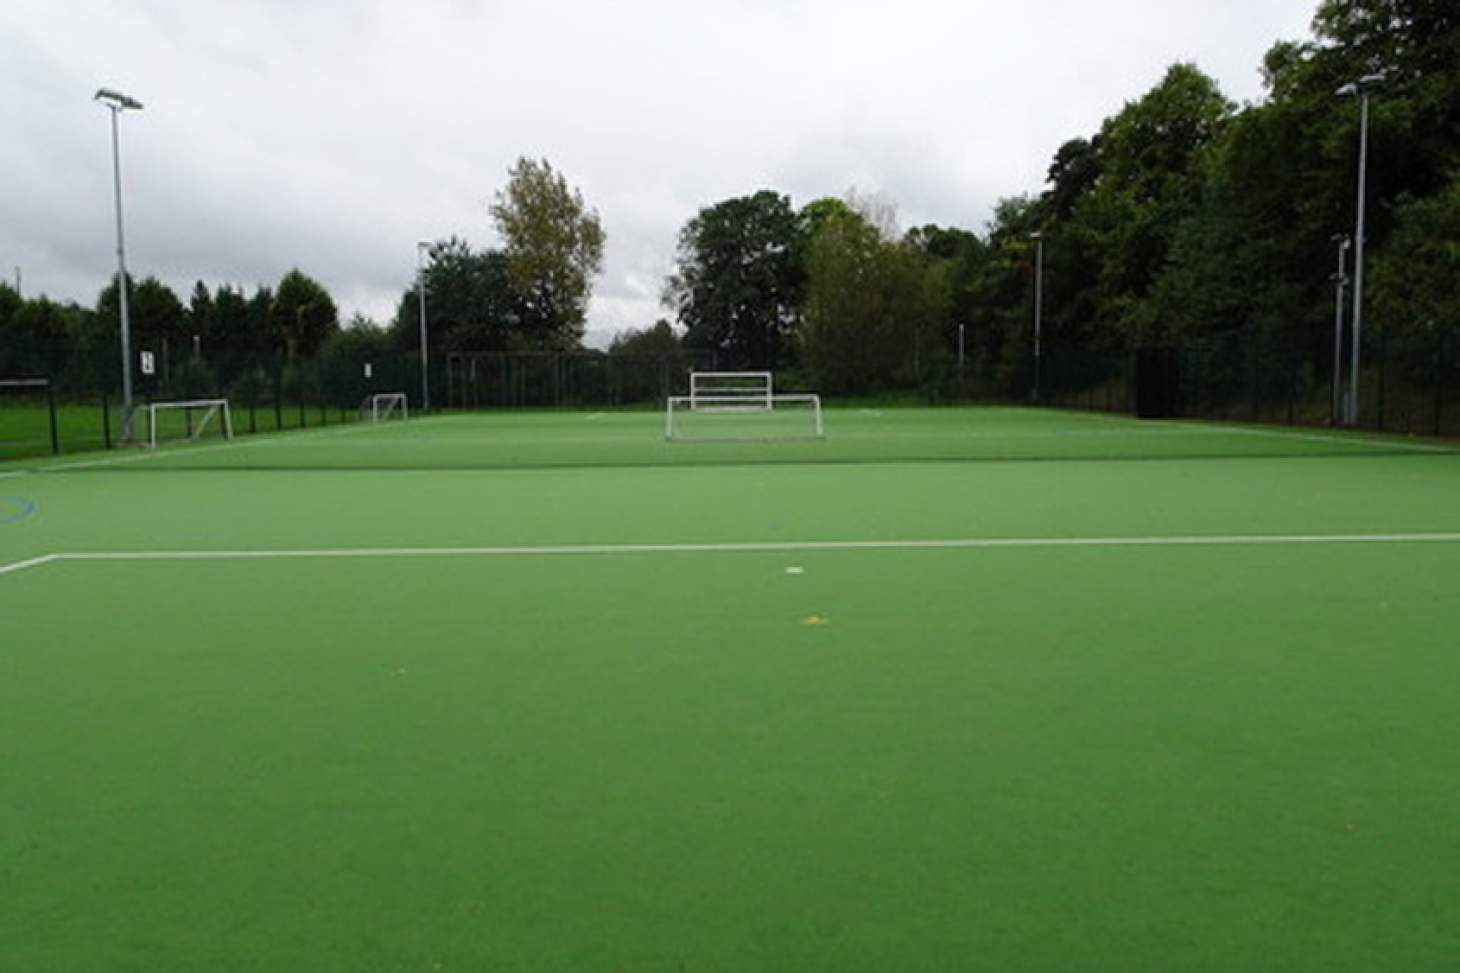 The Barlow RC High School 5 a side | Astroturf football pitch